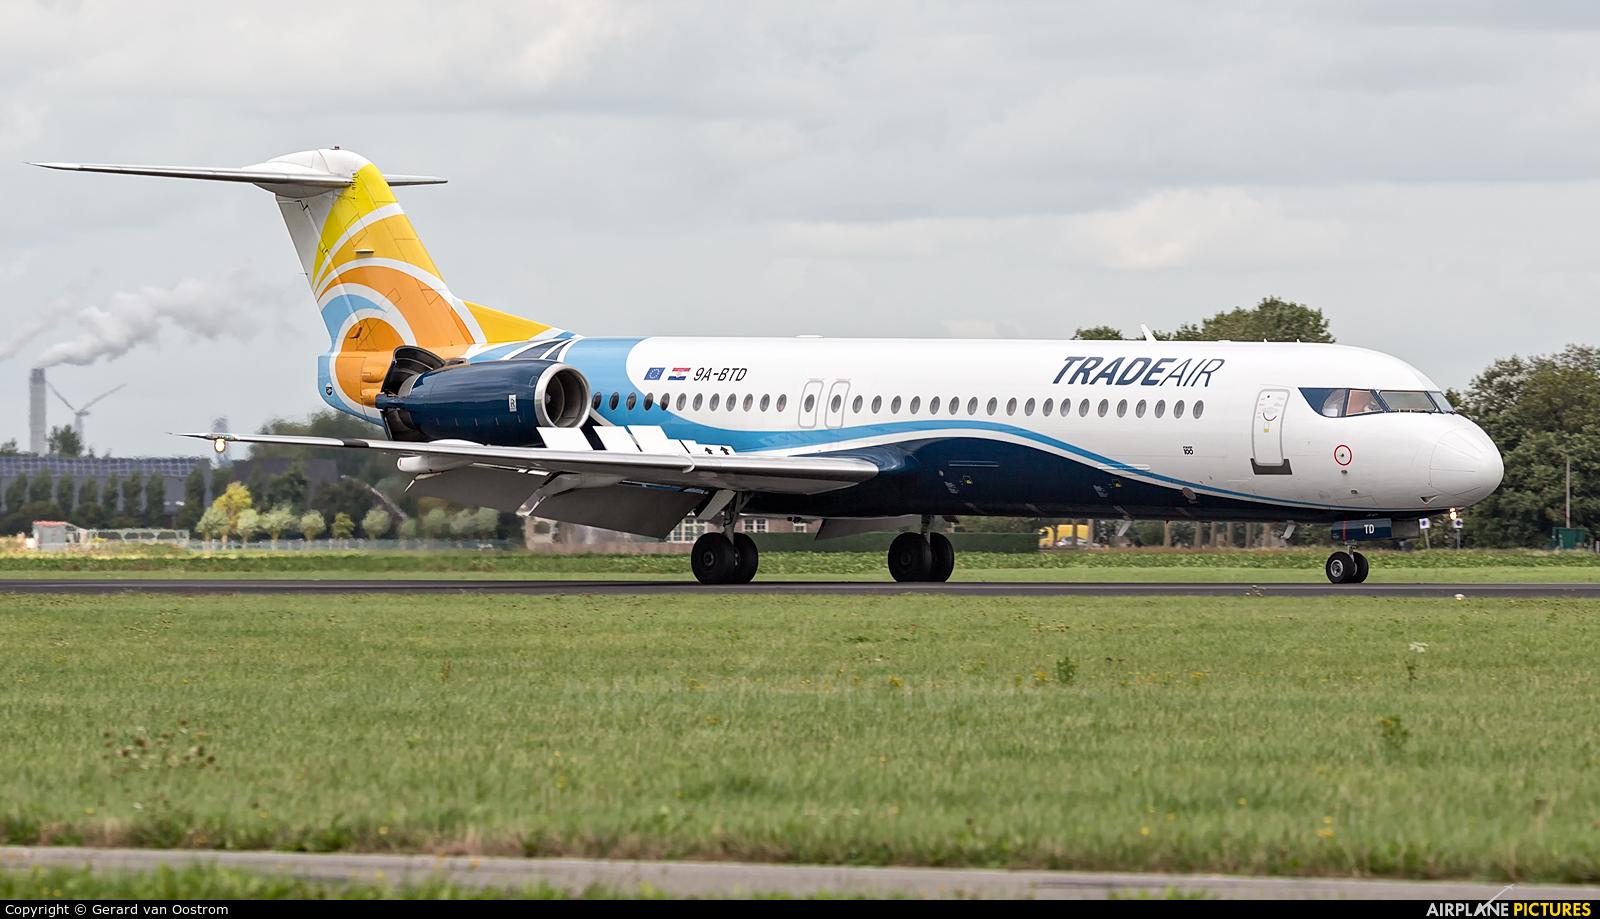 Trade Air 9A-BTD aircraft at Amsterdam - Schiphol